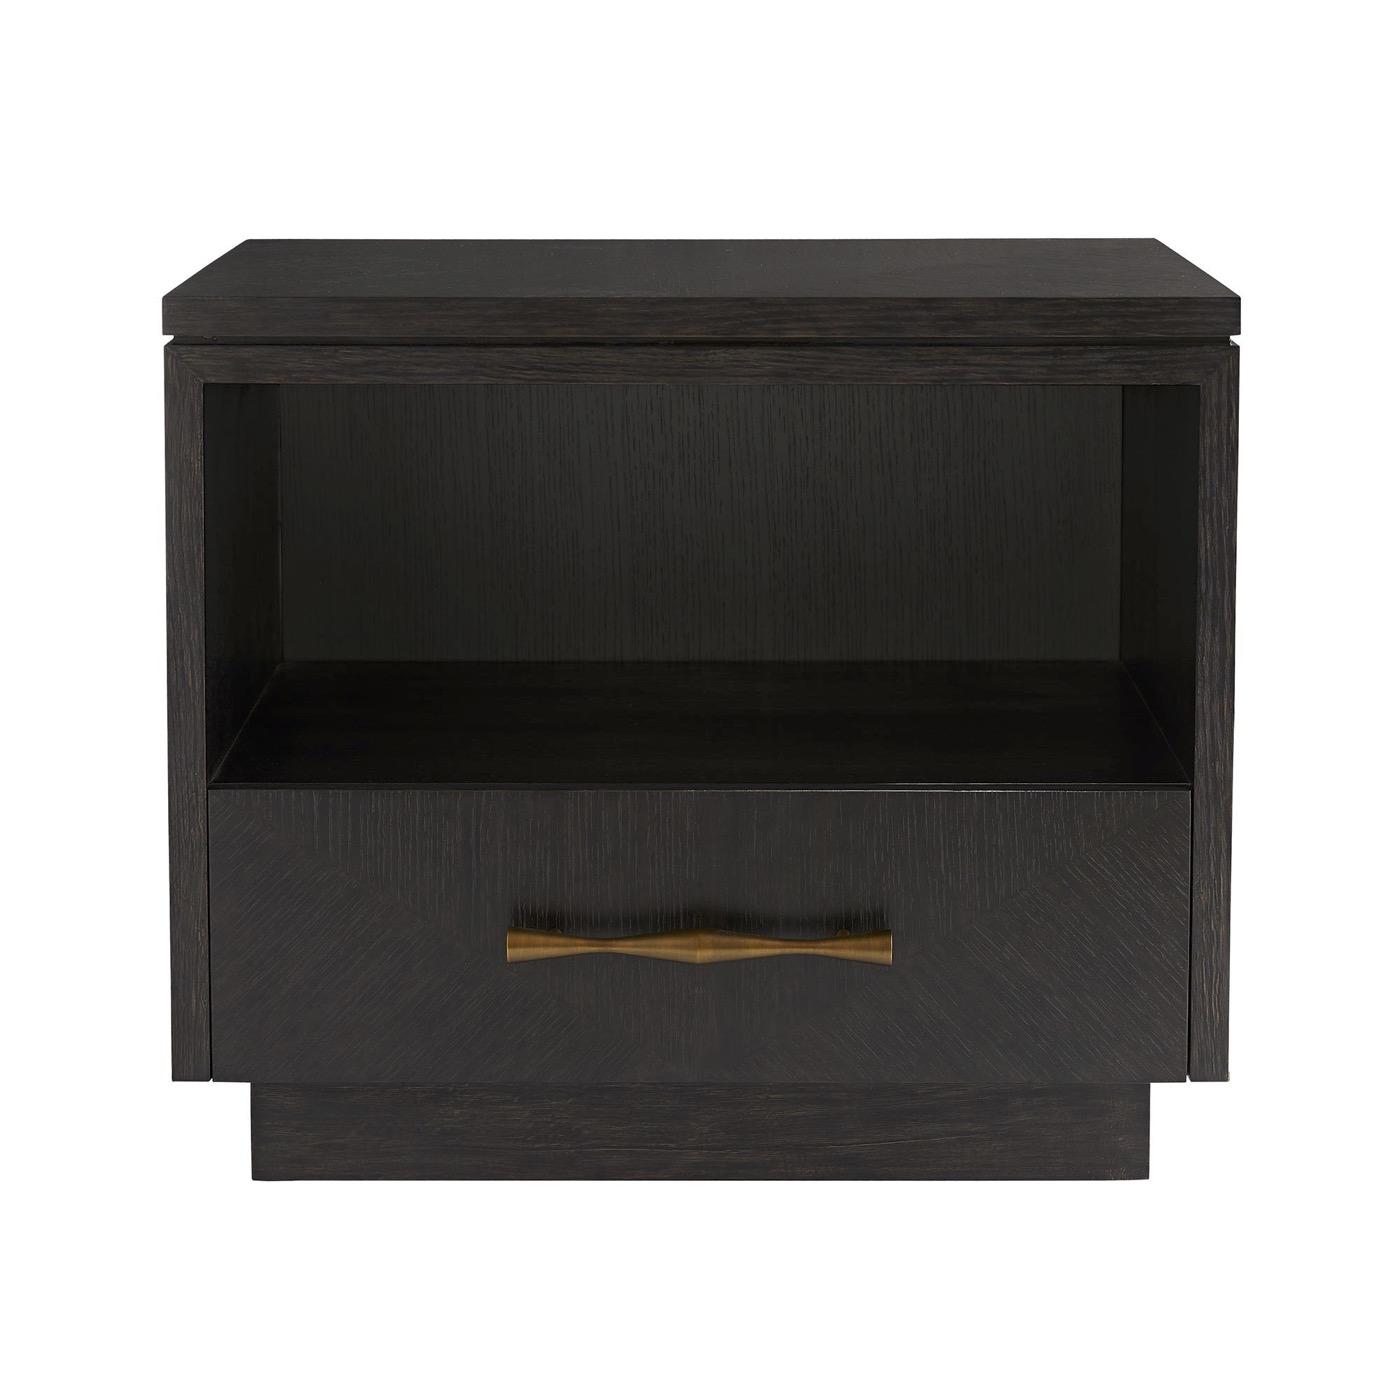 Ruben Side Table | Black